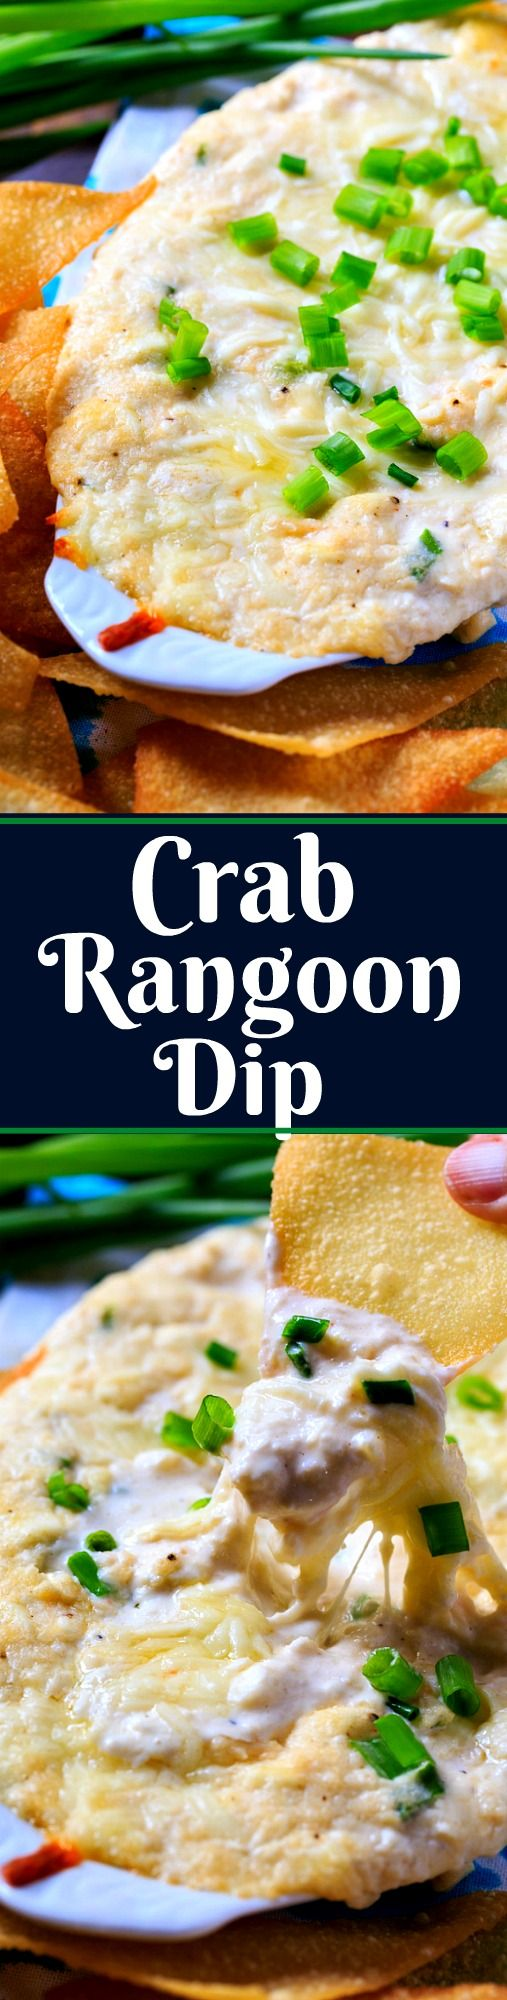 Crab Rangoon Dip with Crispy Wonton Chips